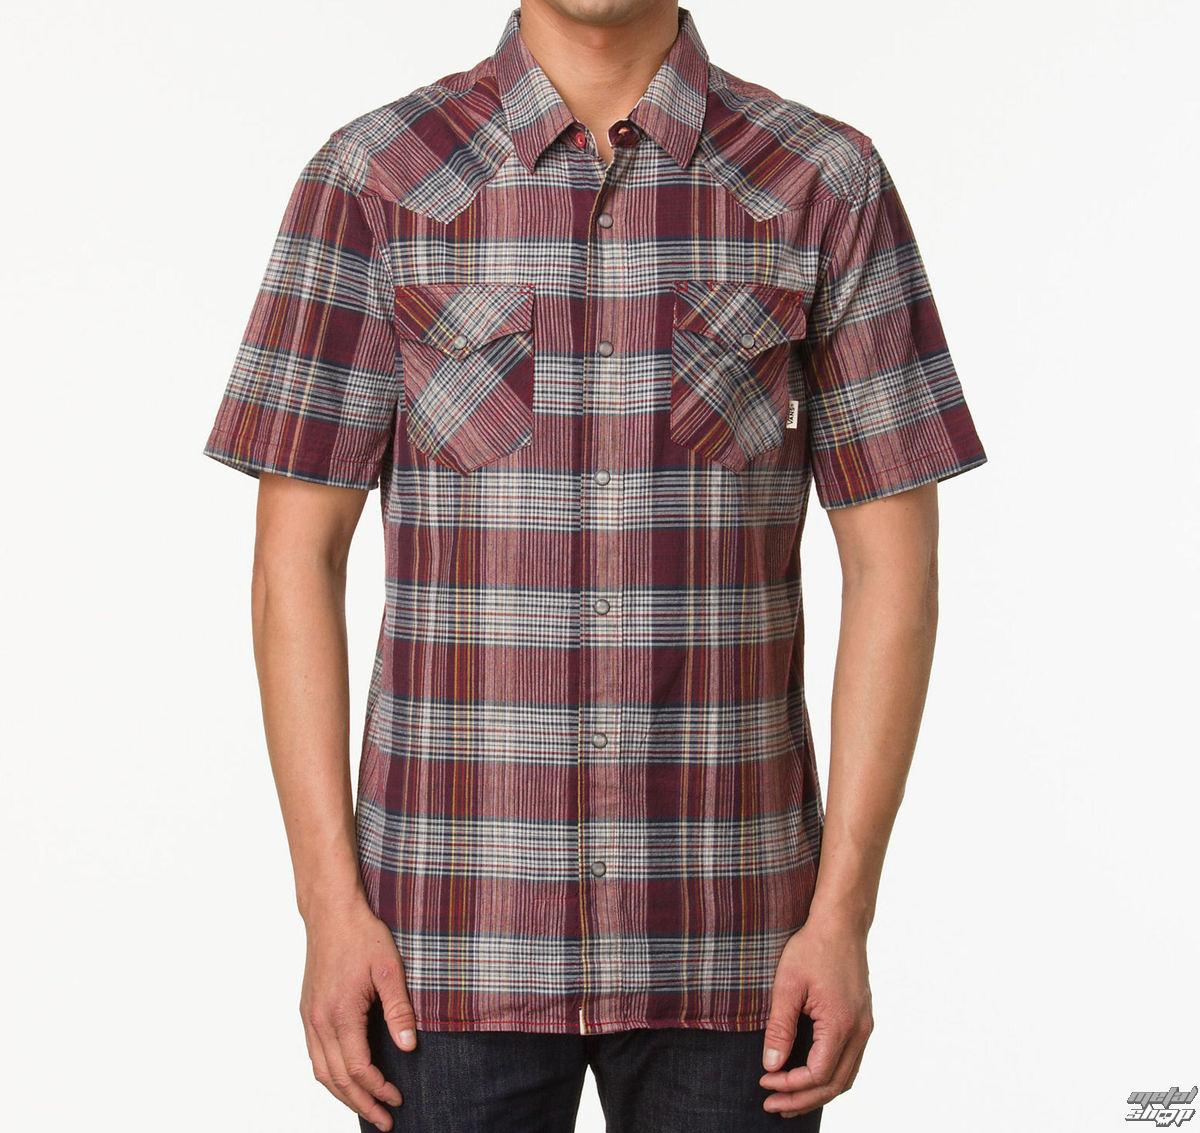 3160496f64e košile pánská VANS - Edgeware - Redrum Plaid - VO47VV - metalshop.cz